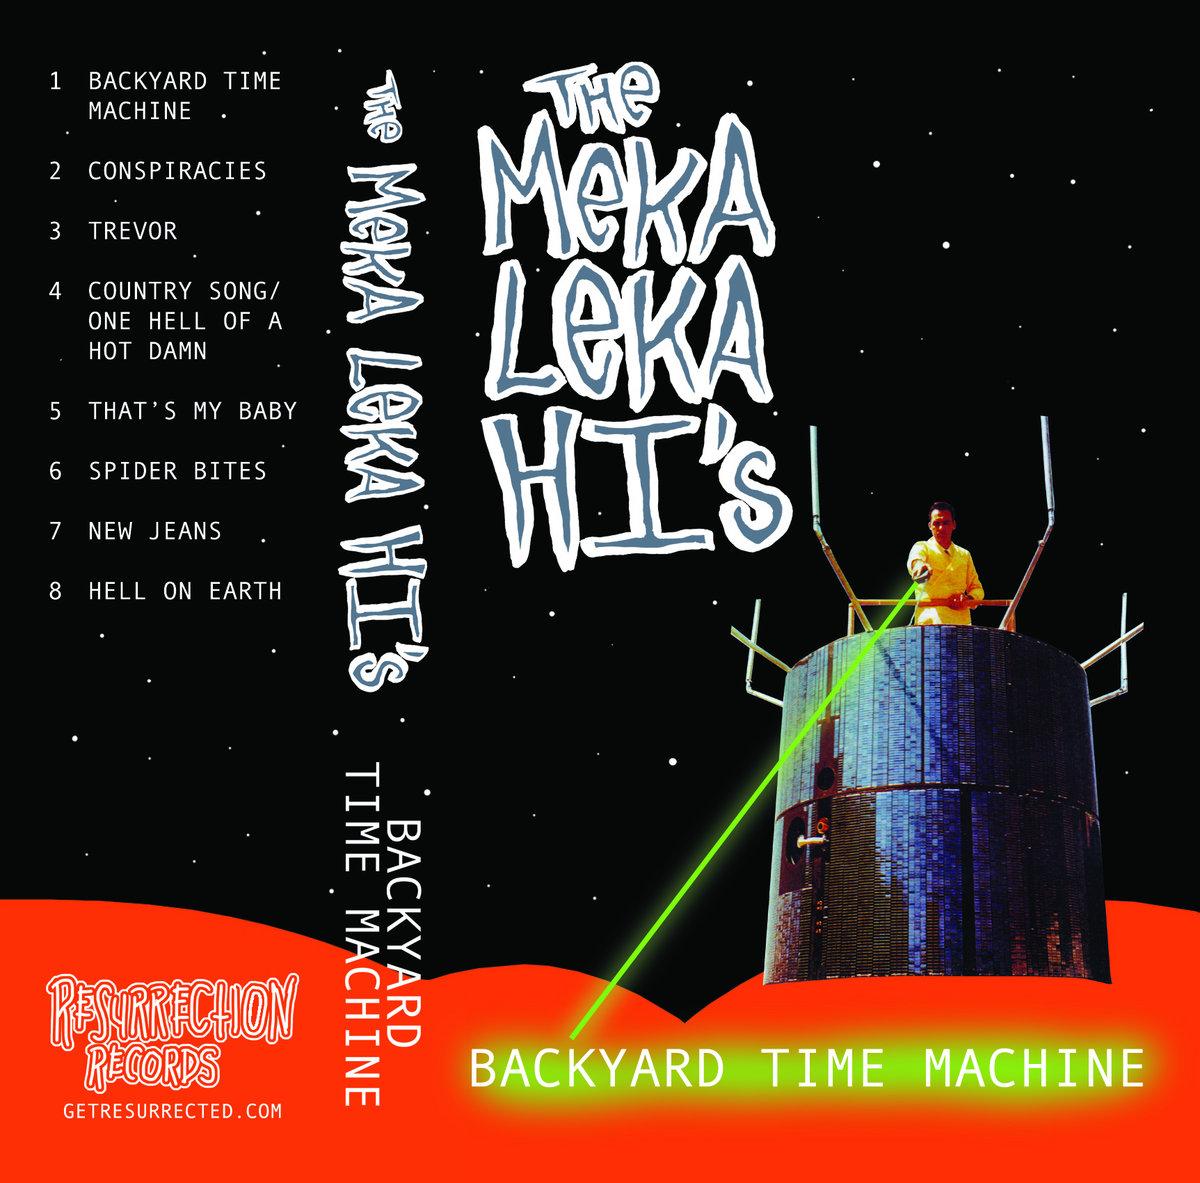 backyard time machine resurrection records